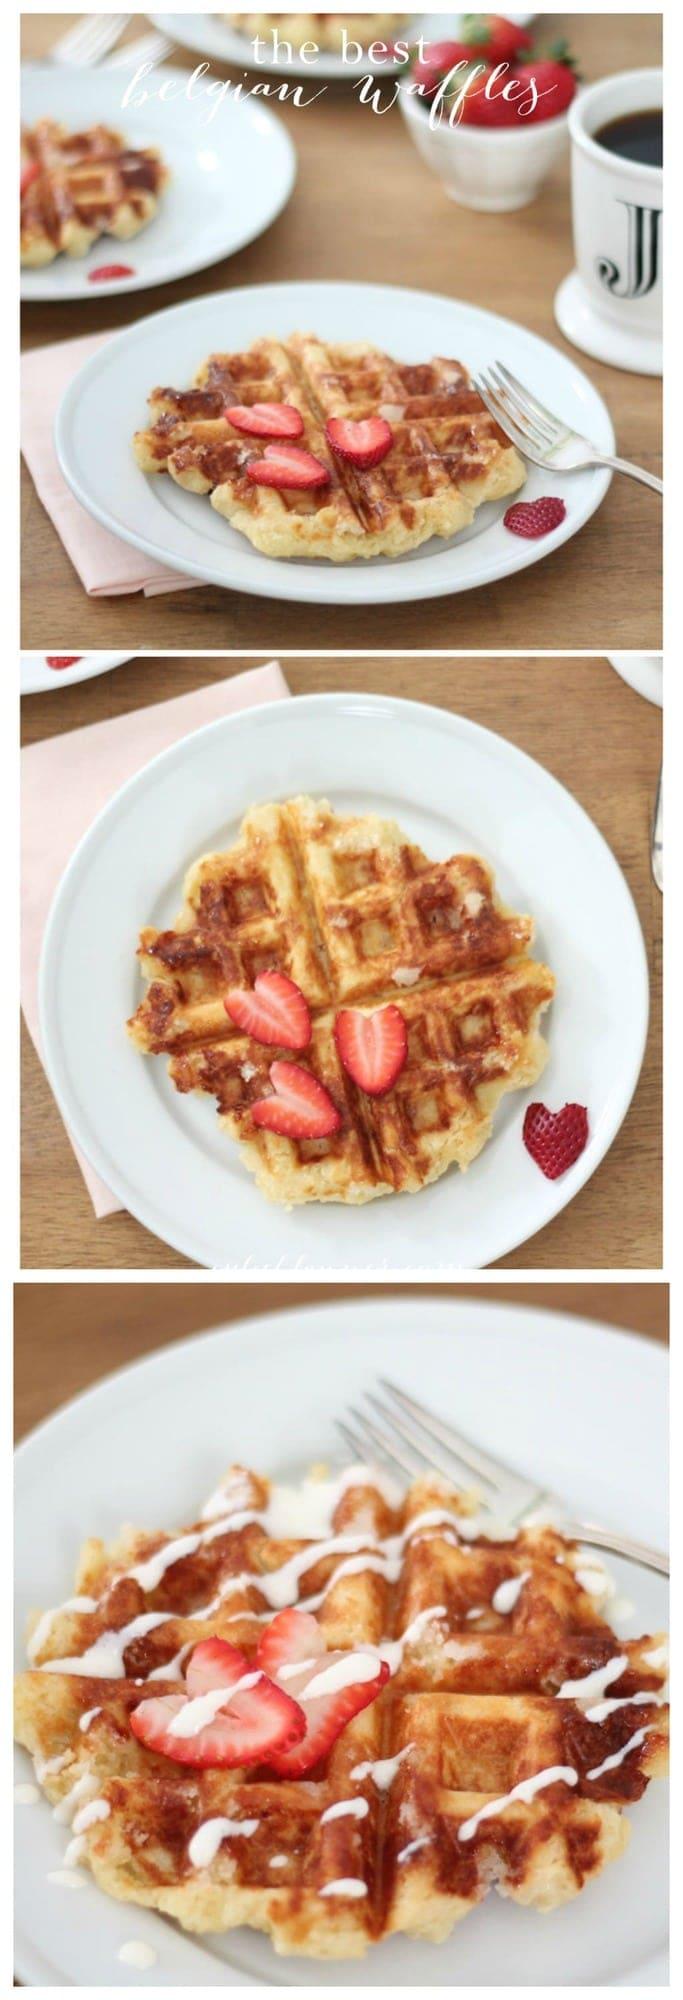 the best Belgian waffle recipe - hands down - with sweet creme fraiche! Great for breakfast, brunch or dessert via julieblanner.com